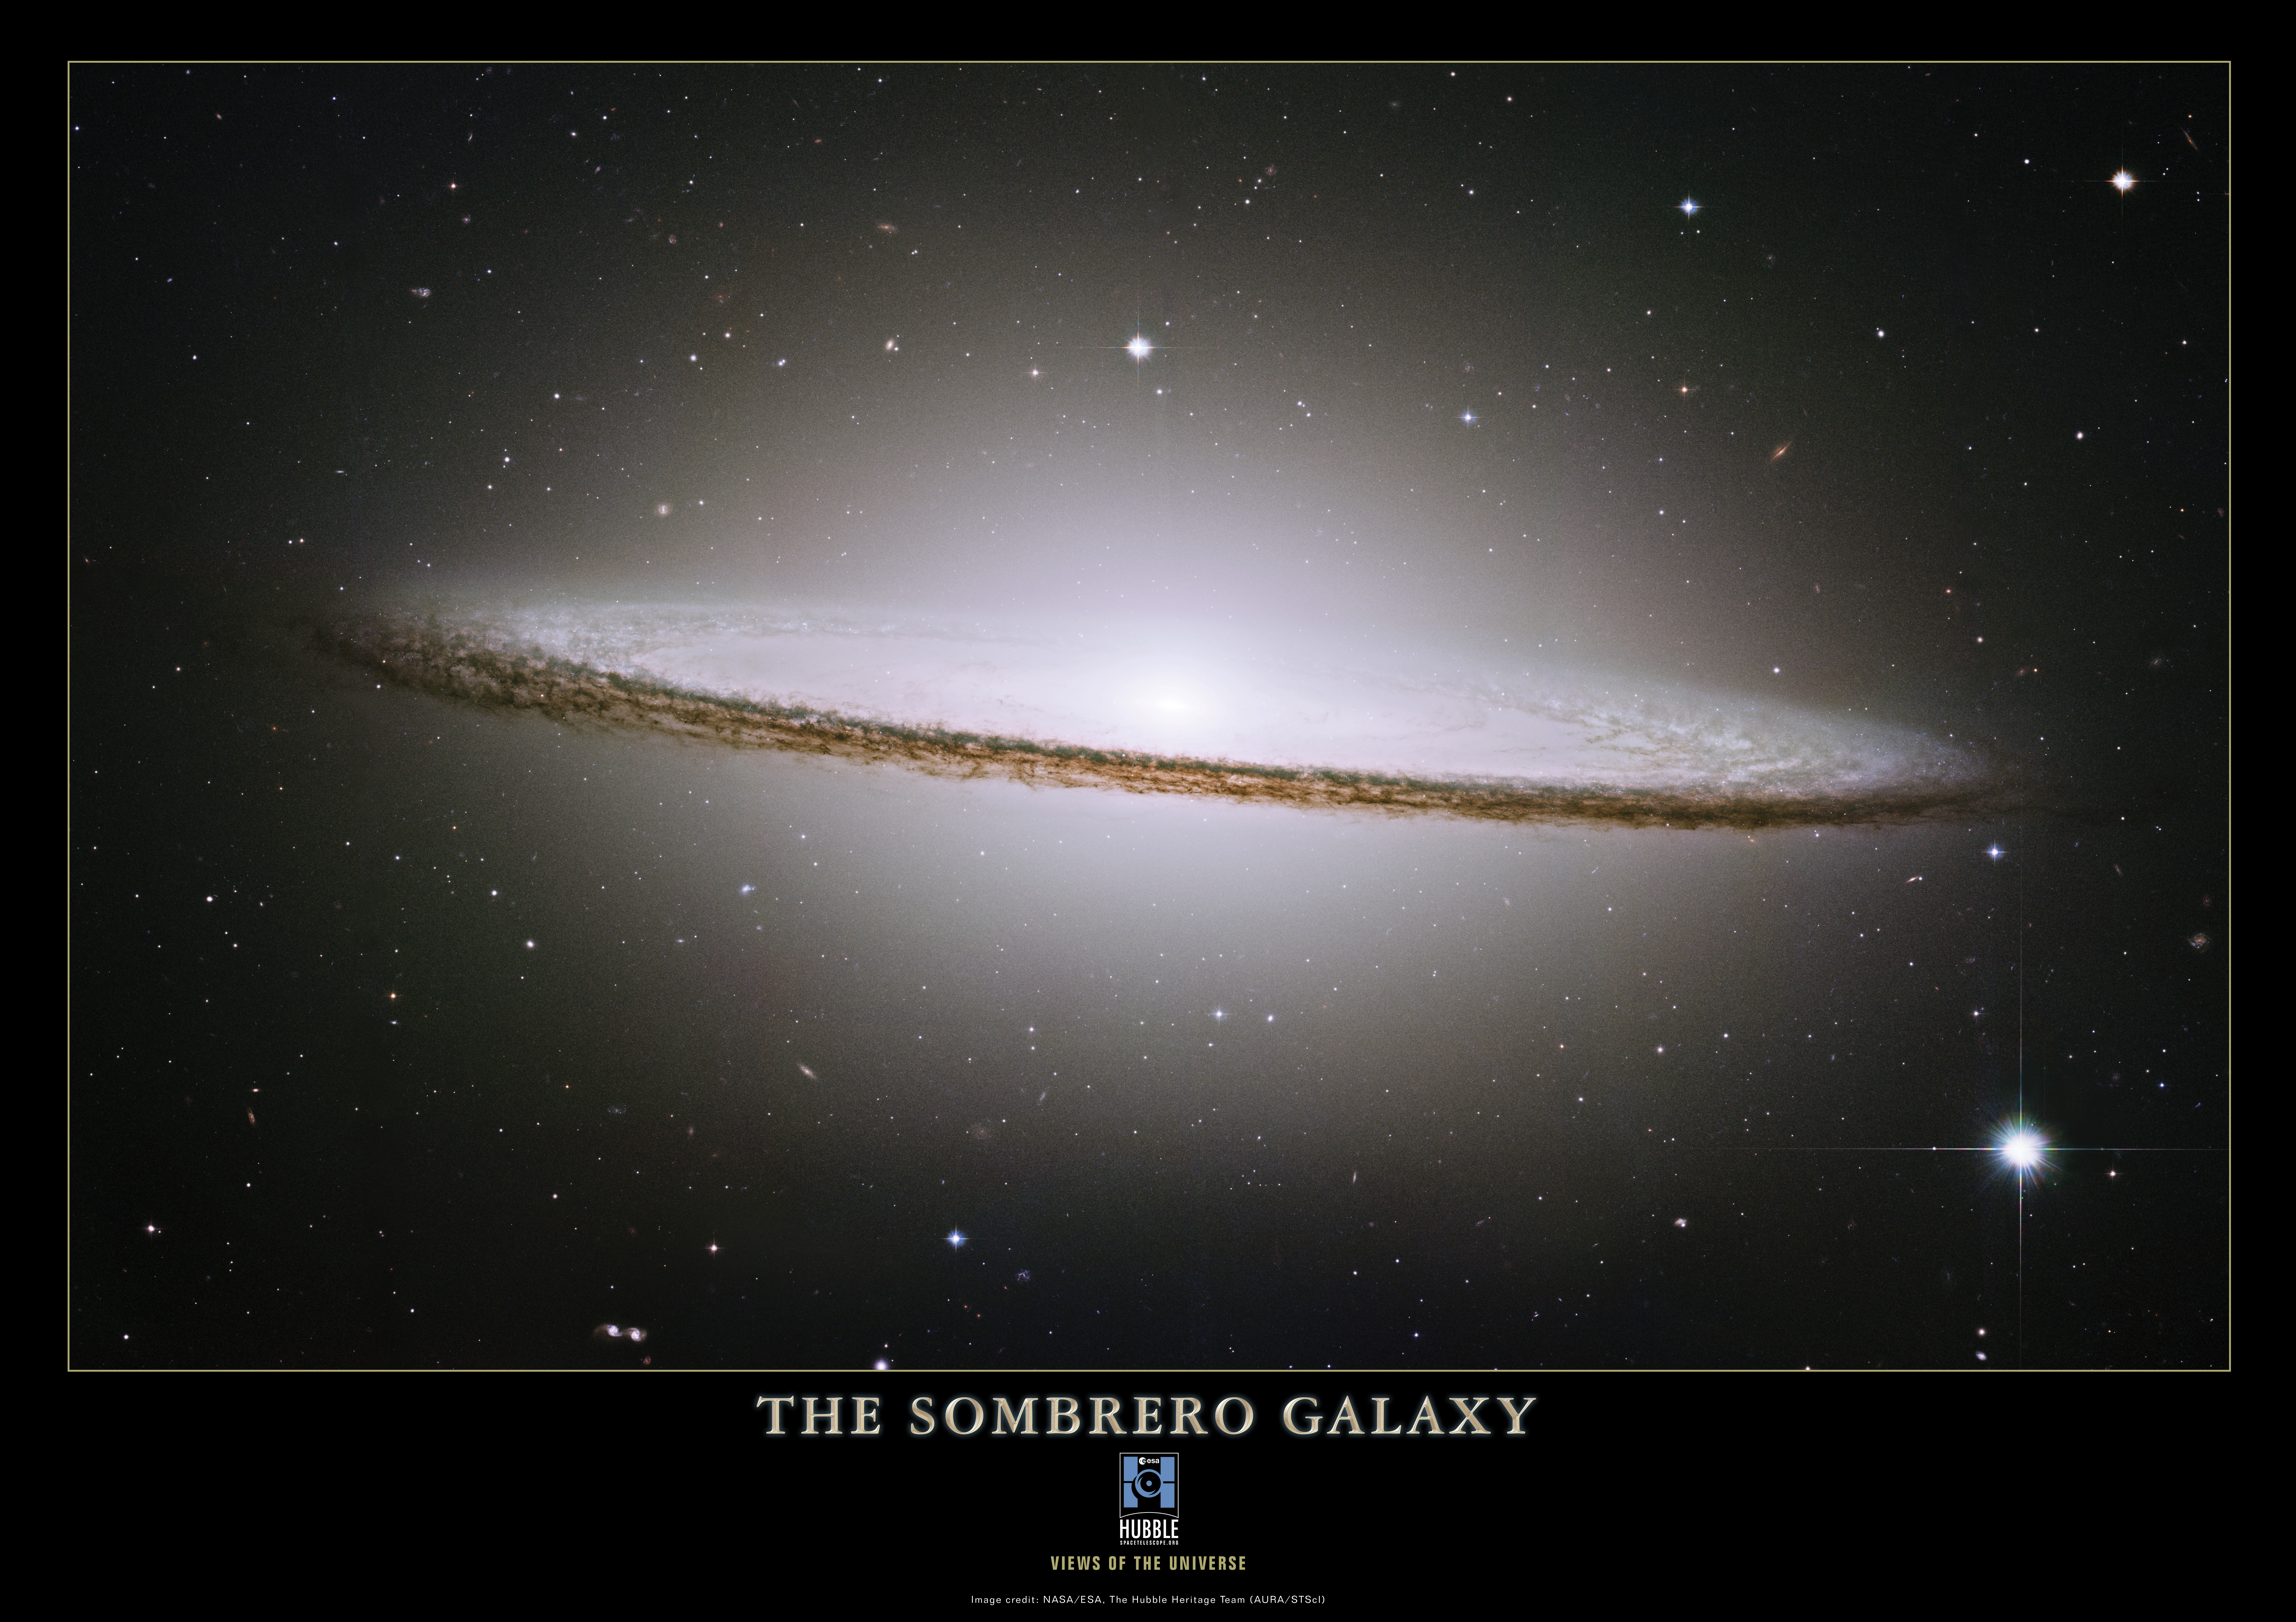 The Sombrero Galaxy Esahubble